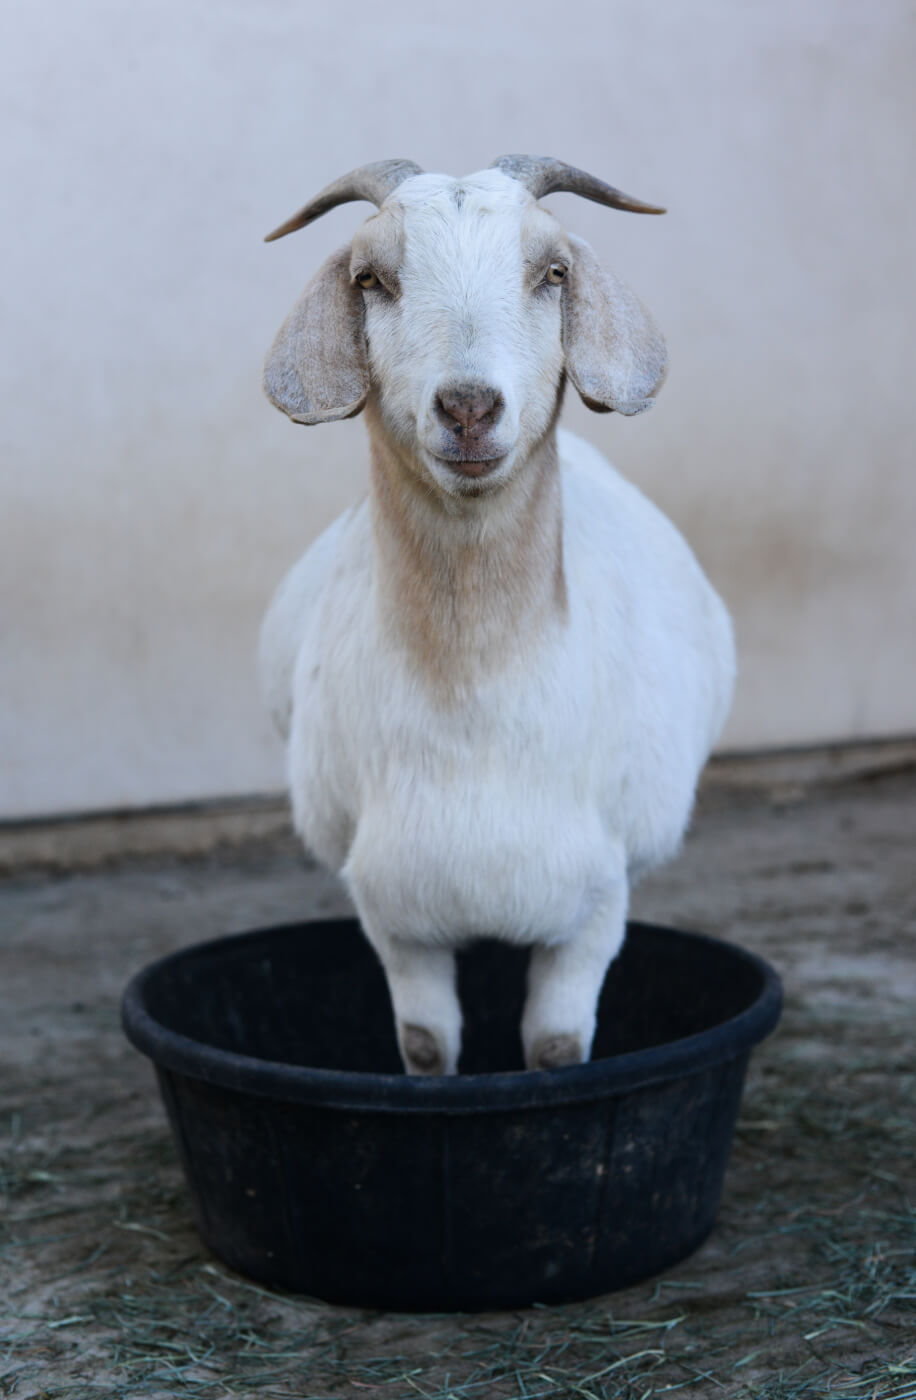 Rescued Goat At Farm Sanctuary In California